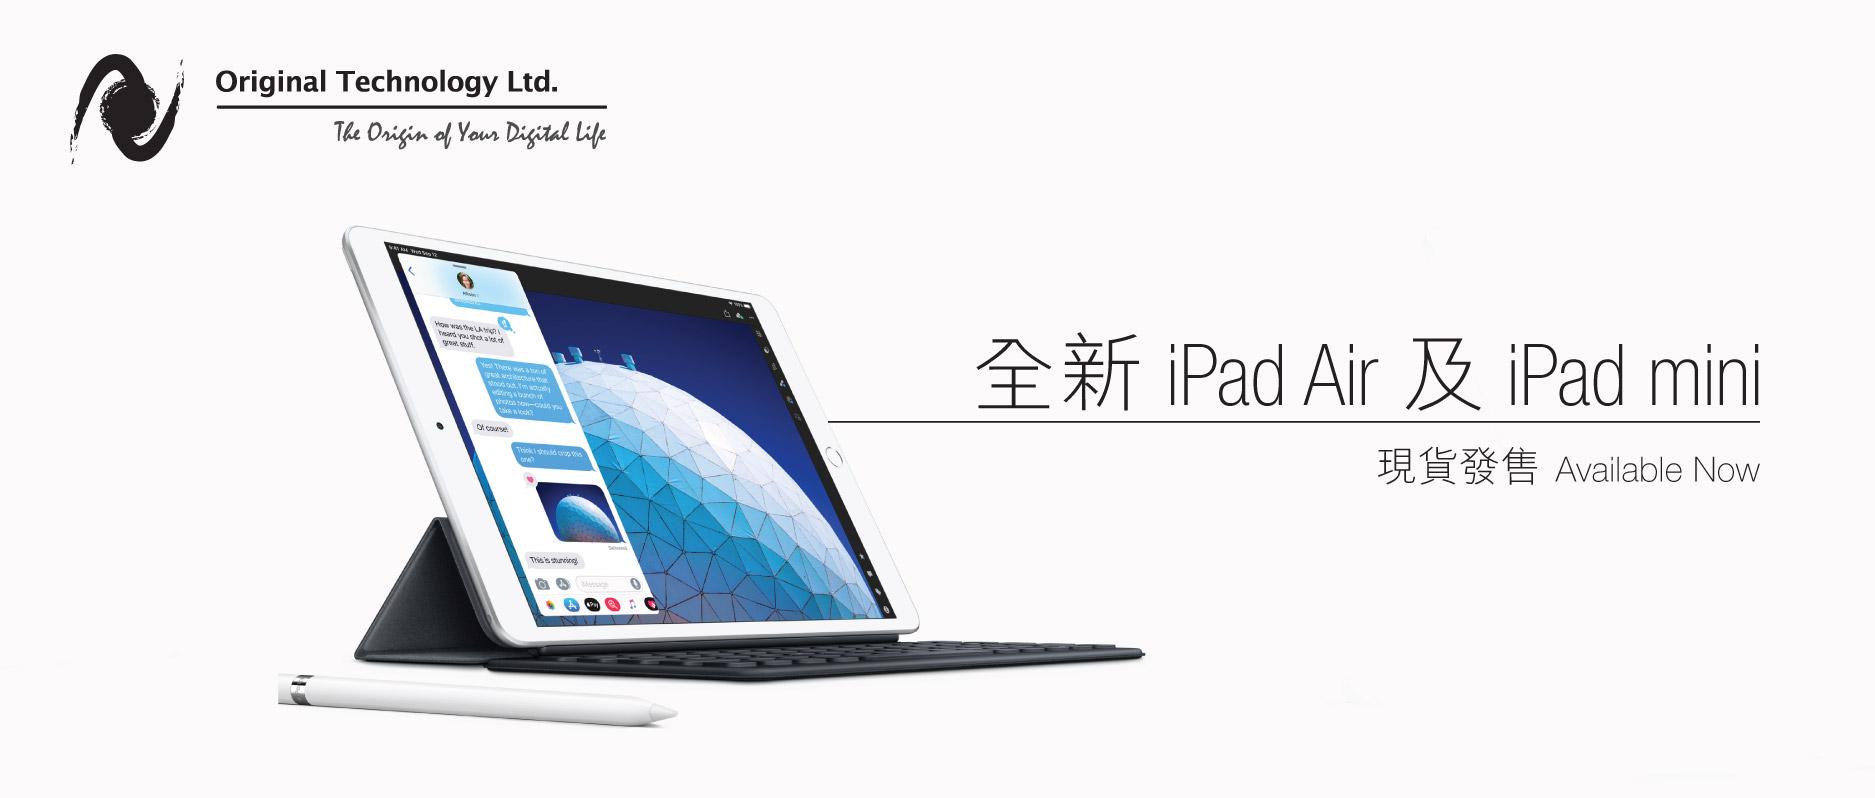 NA06_iPad Air & iPad mini_Available Now_900x383_01_WeChat_Case.jpg